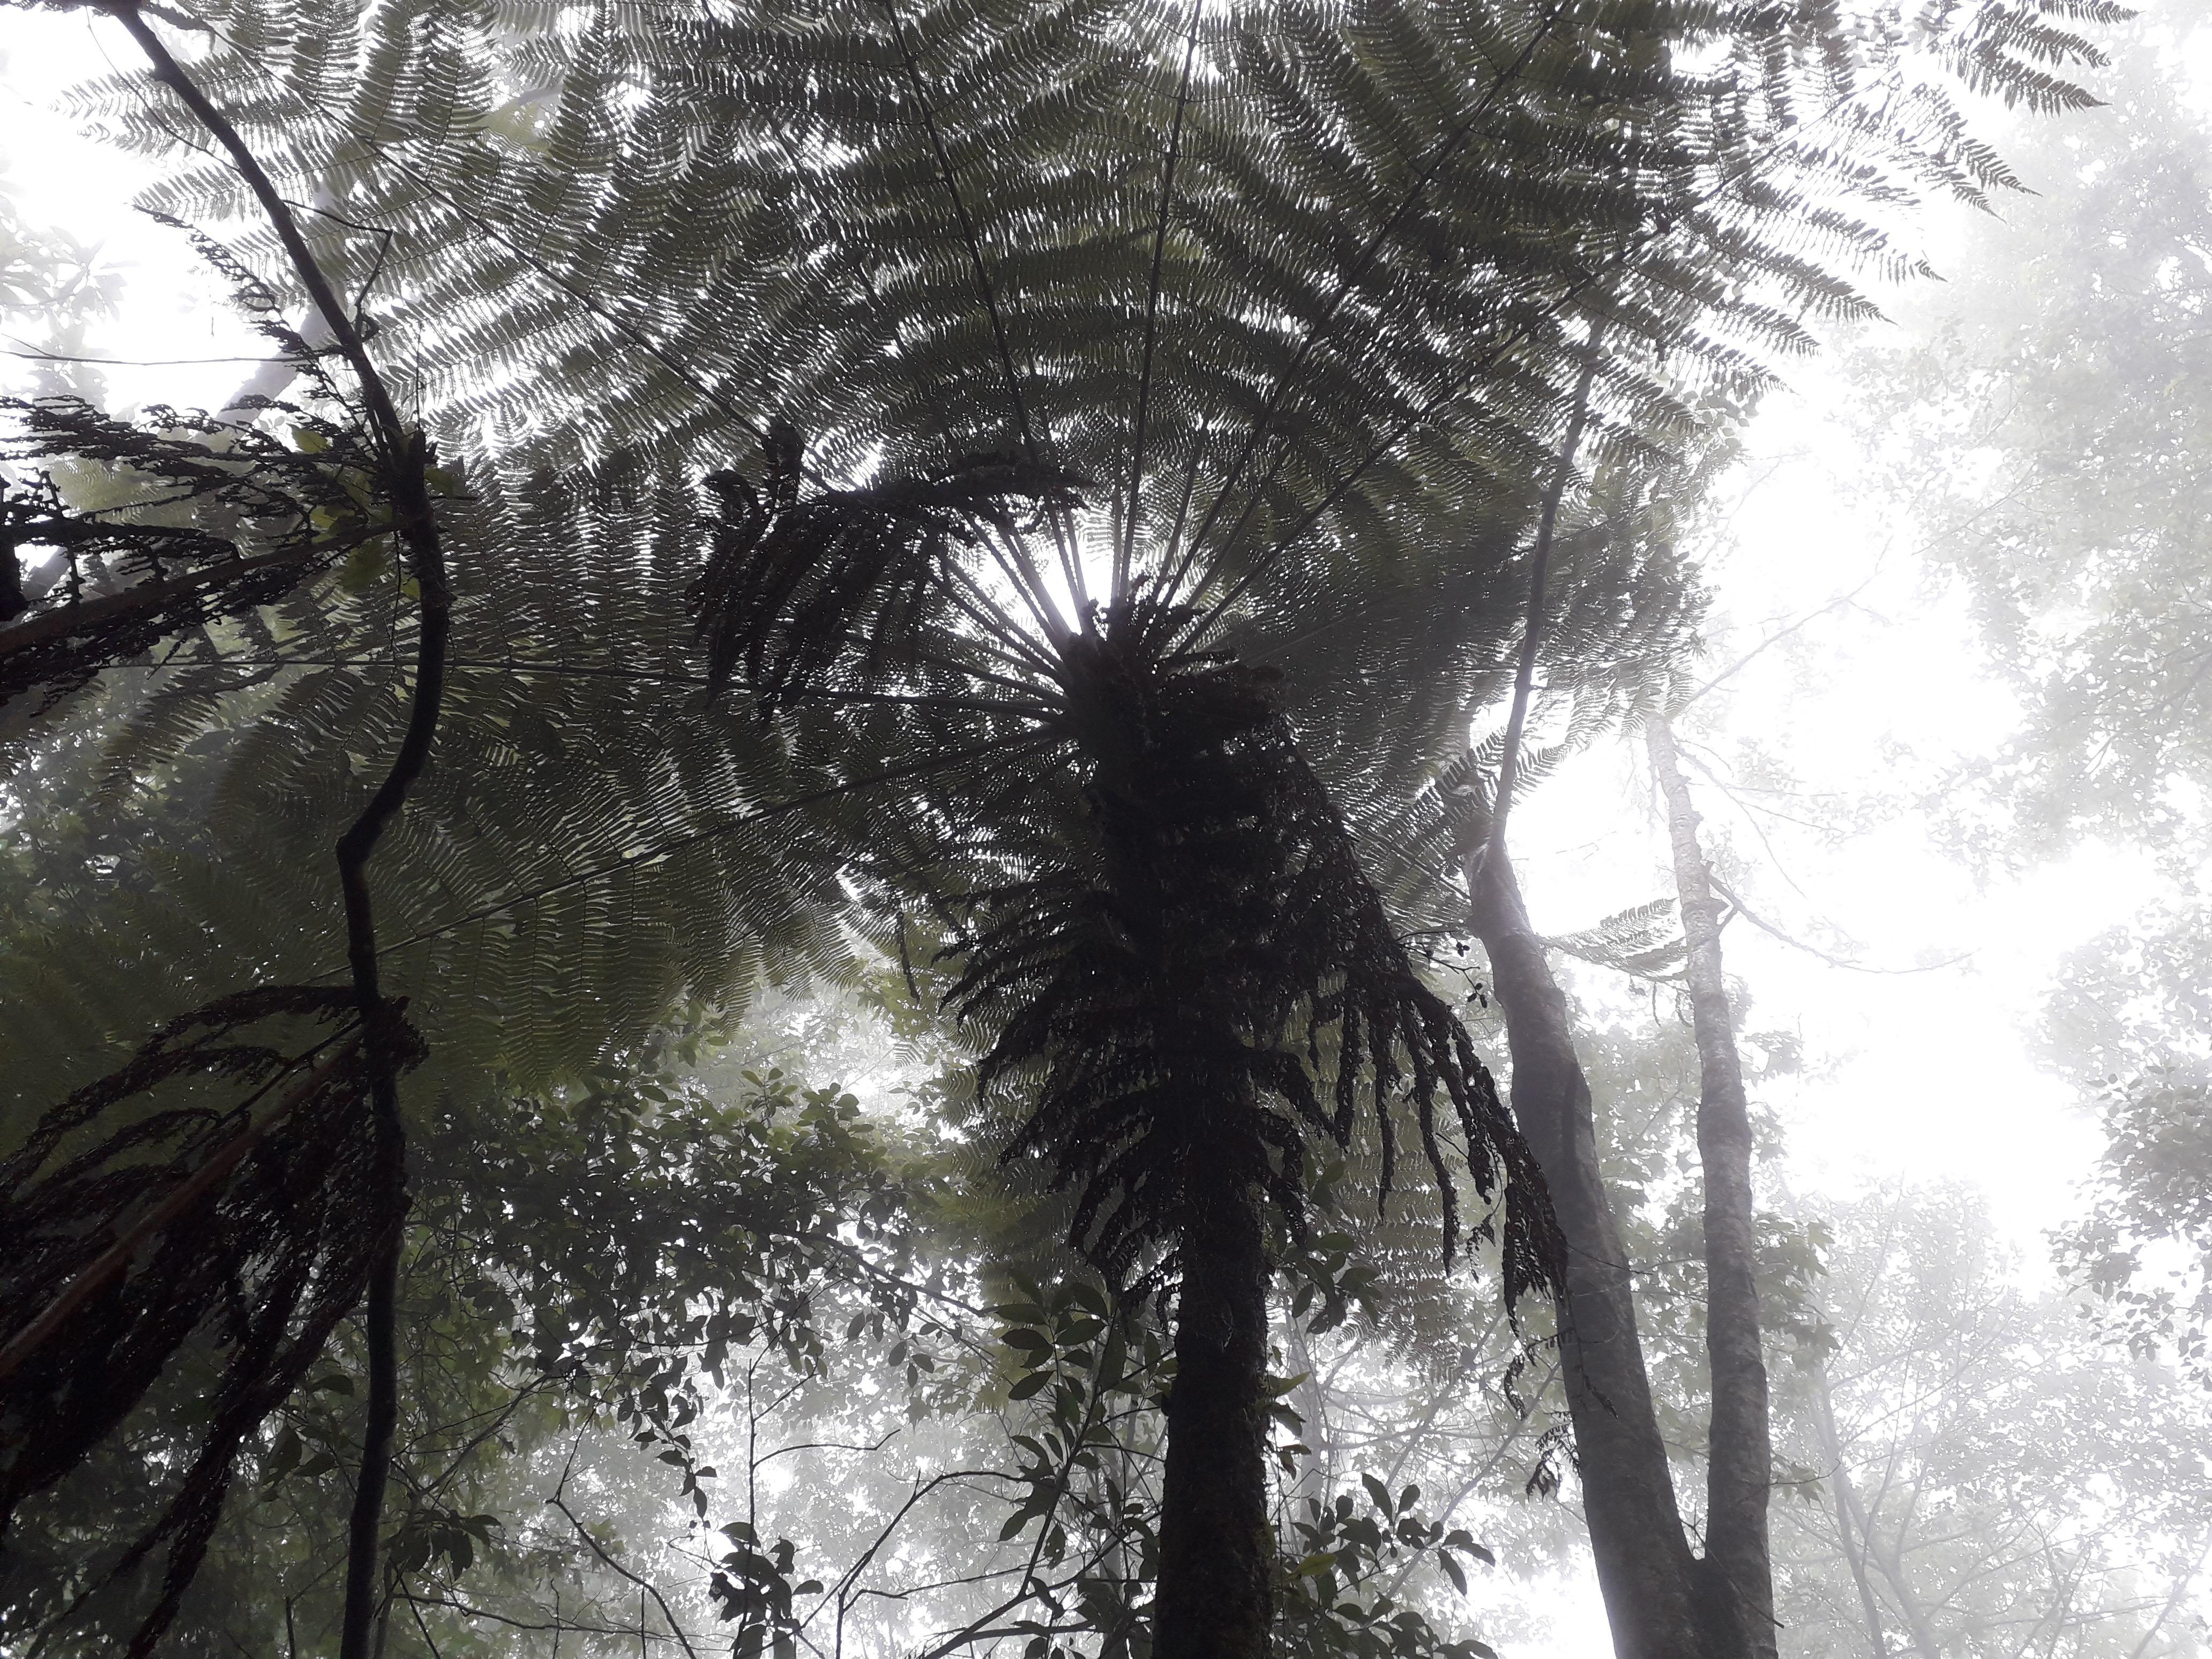 Bosque de niebla secundario, Veracruz, México